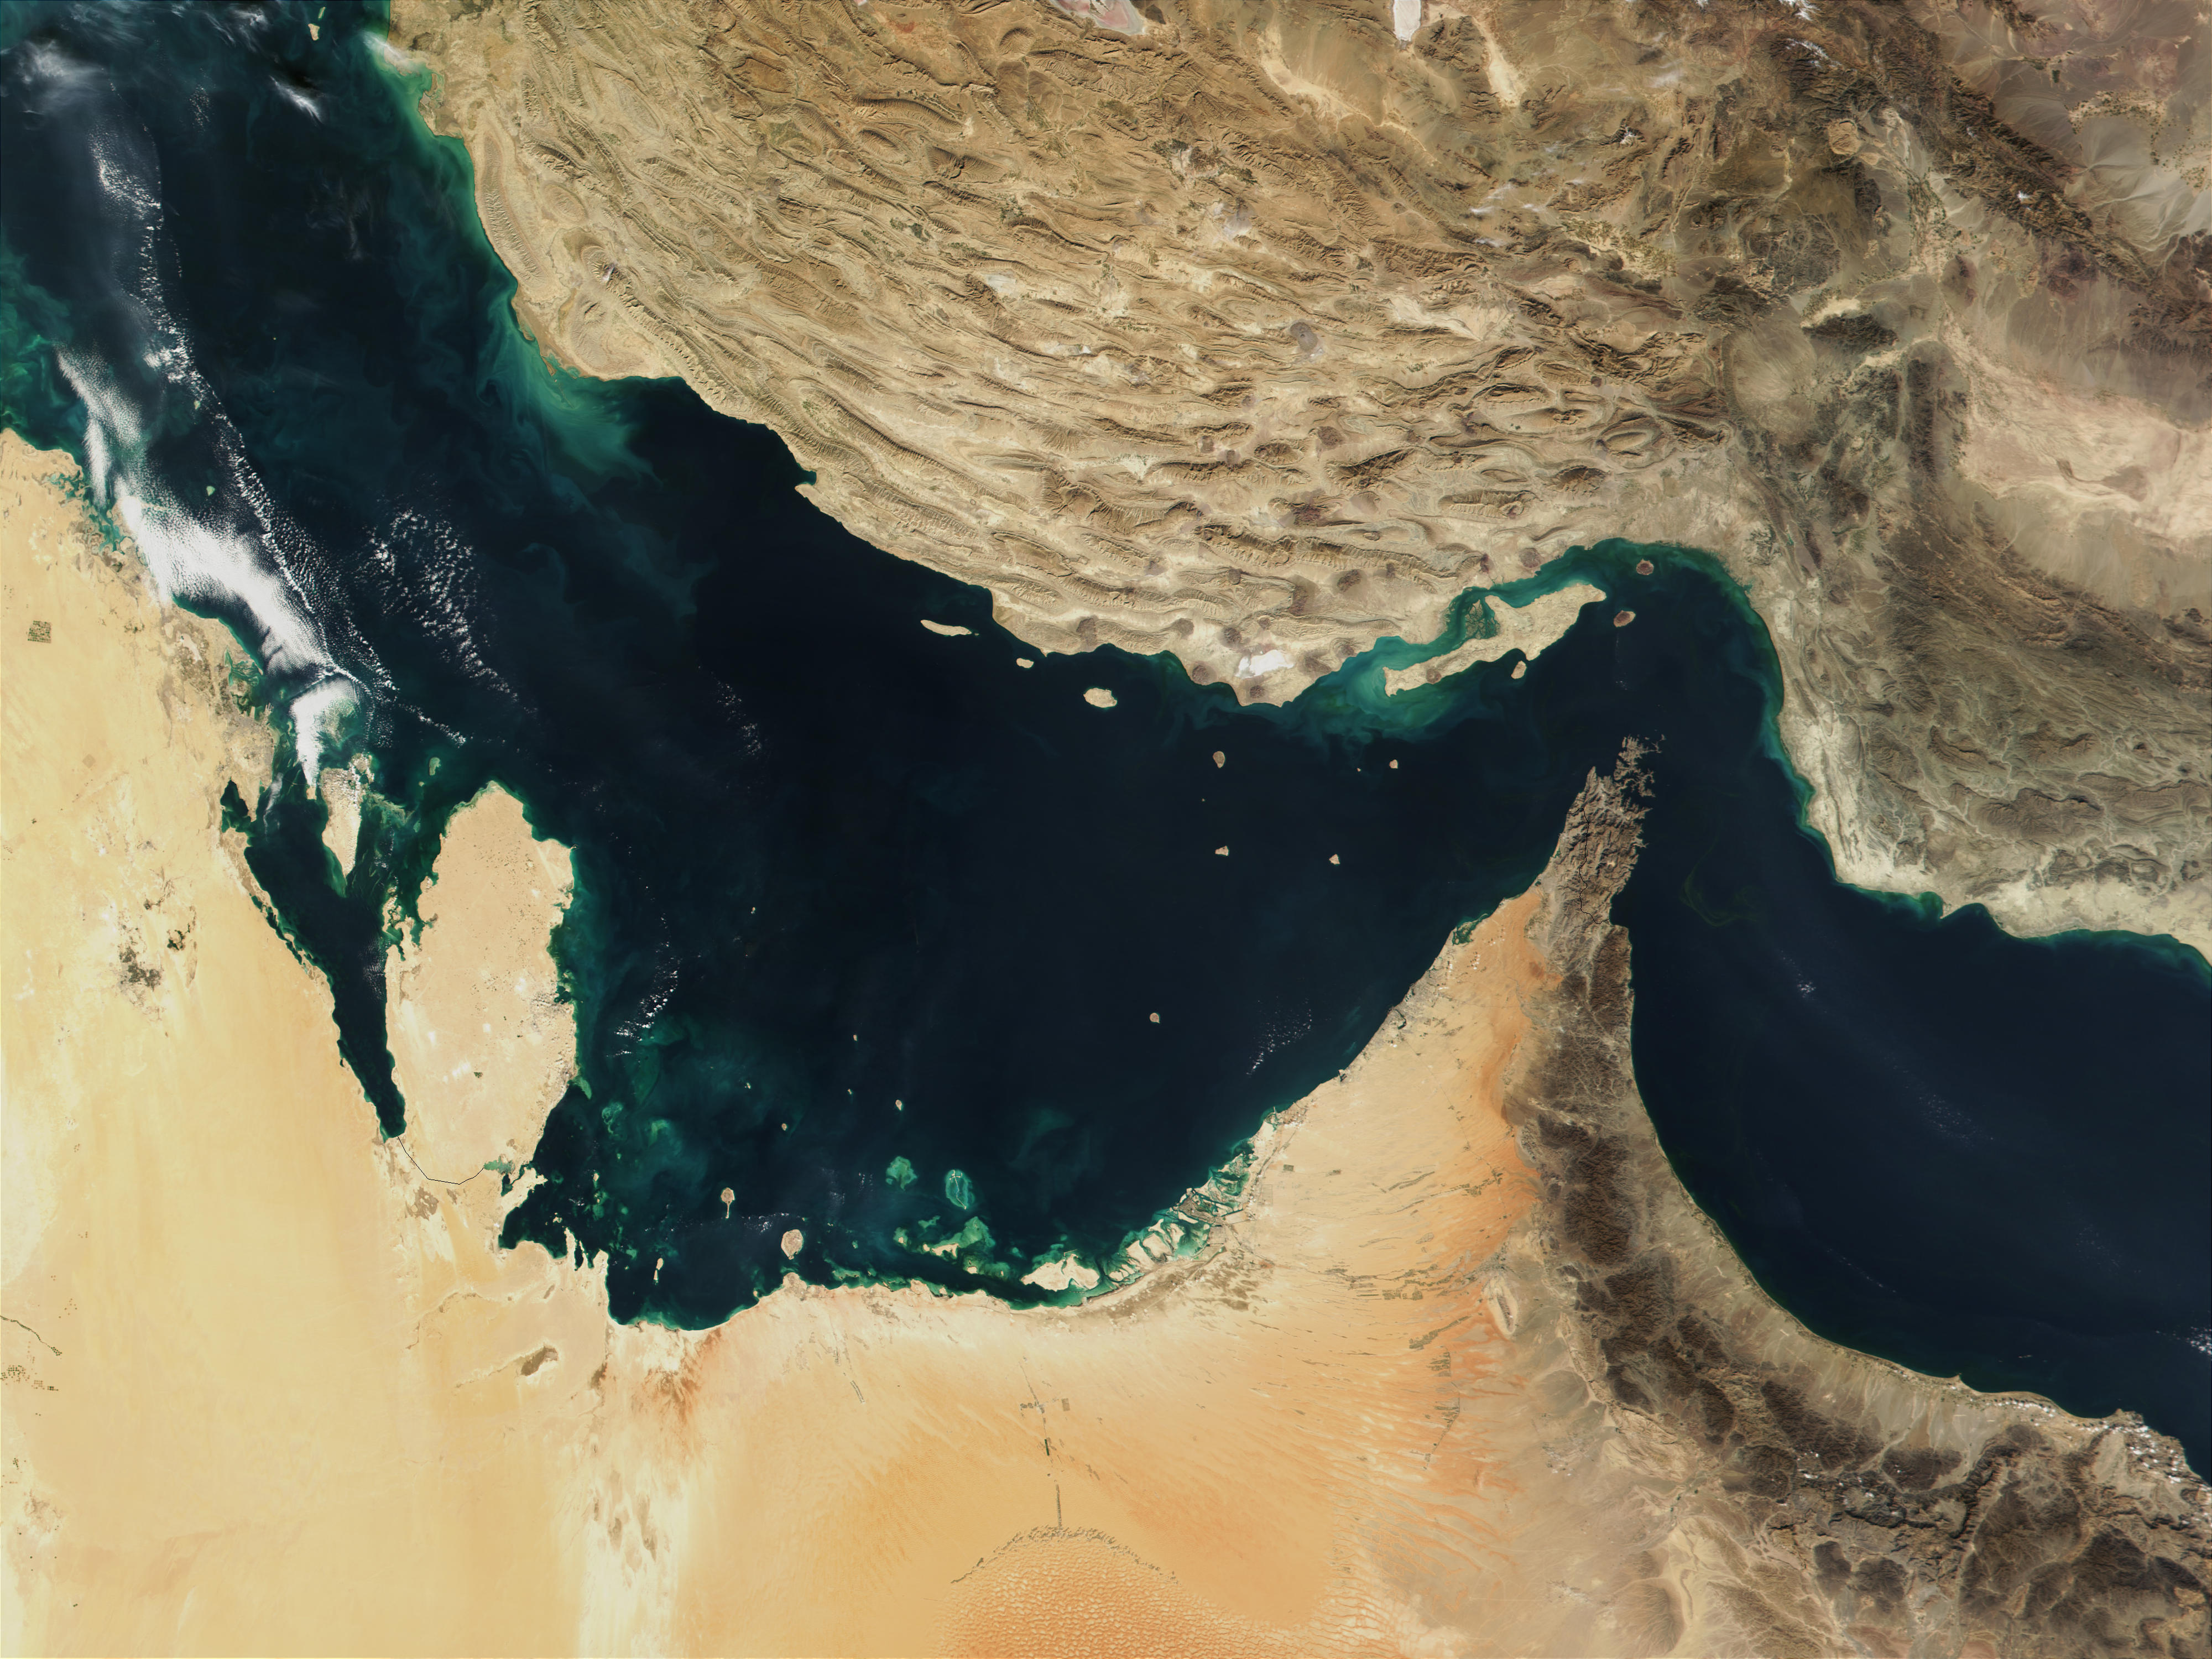 Golfo Pérsico y golfo de Omán